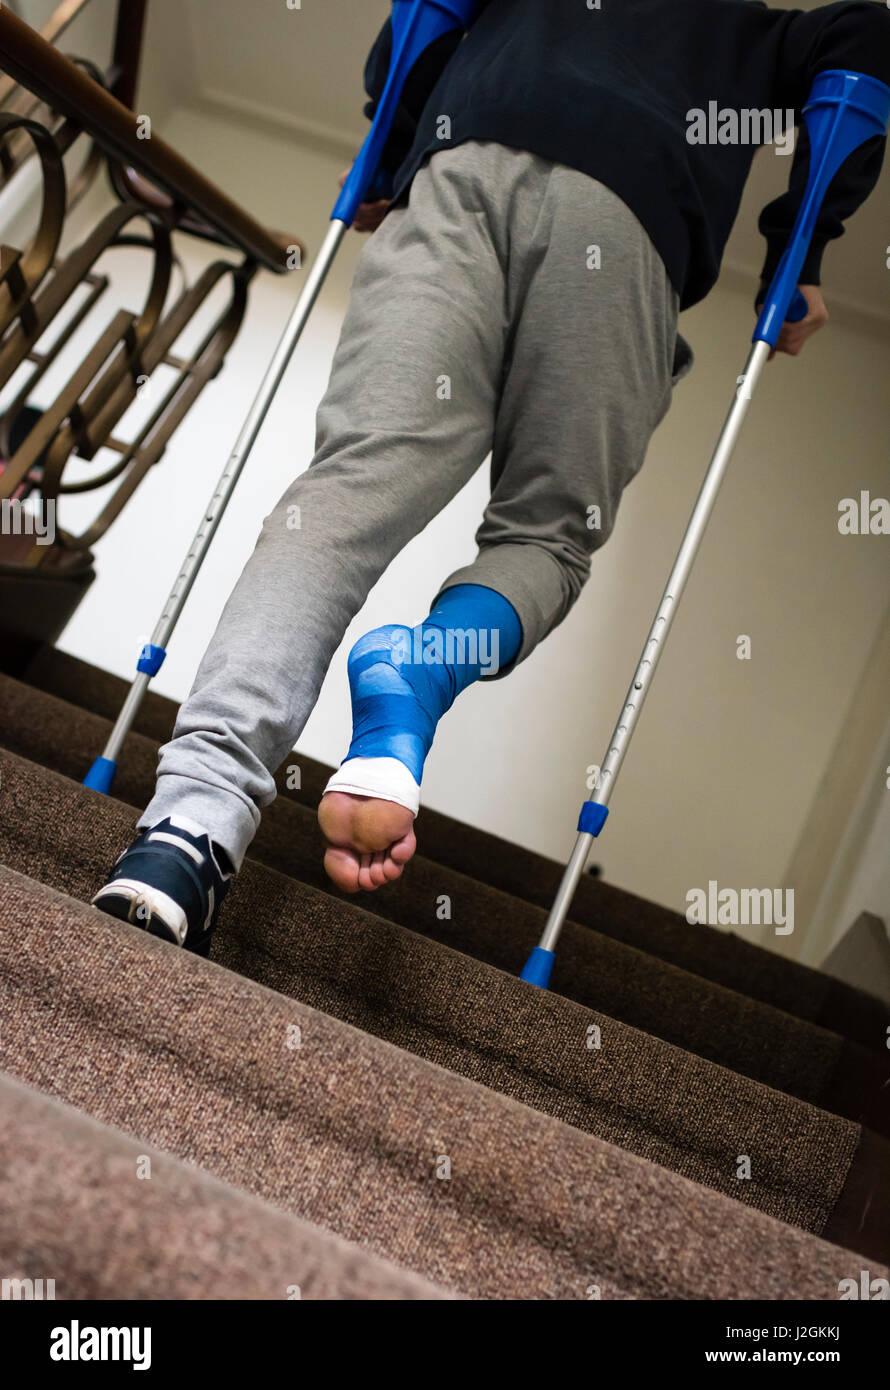 crutches leg in plaster stockfotos crutches leg in plaster bilder alamy. Black Bedroom Furniture Sets. Home Design Ideas